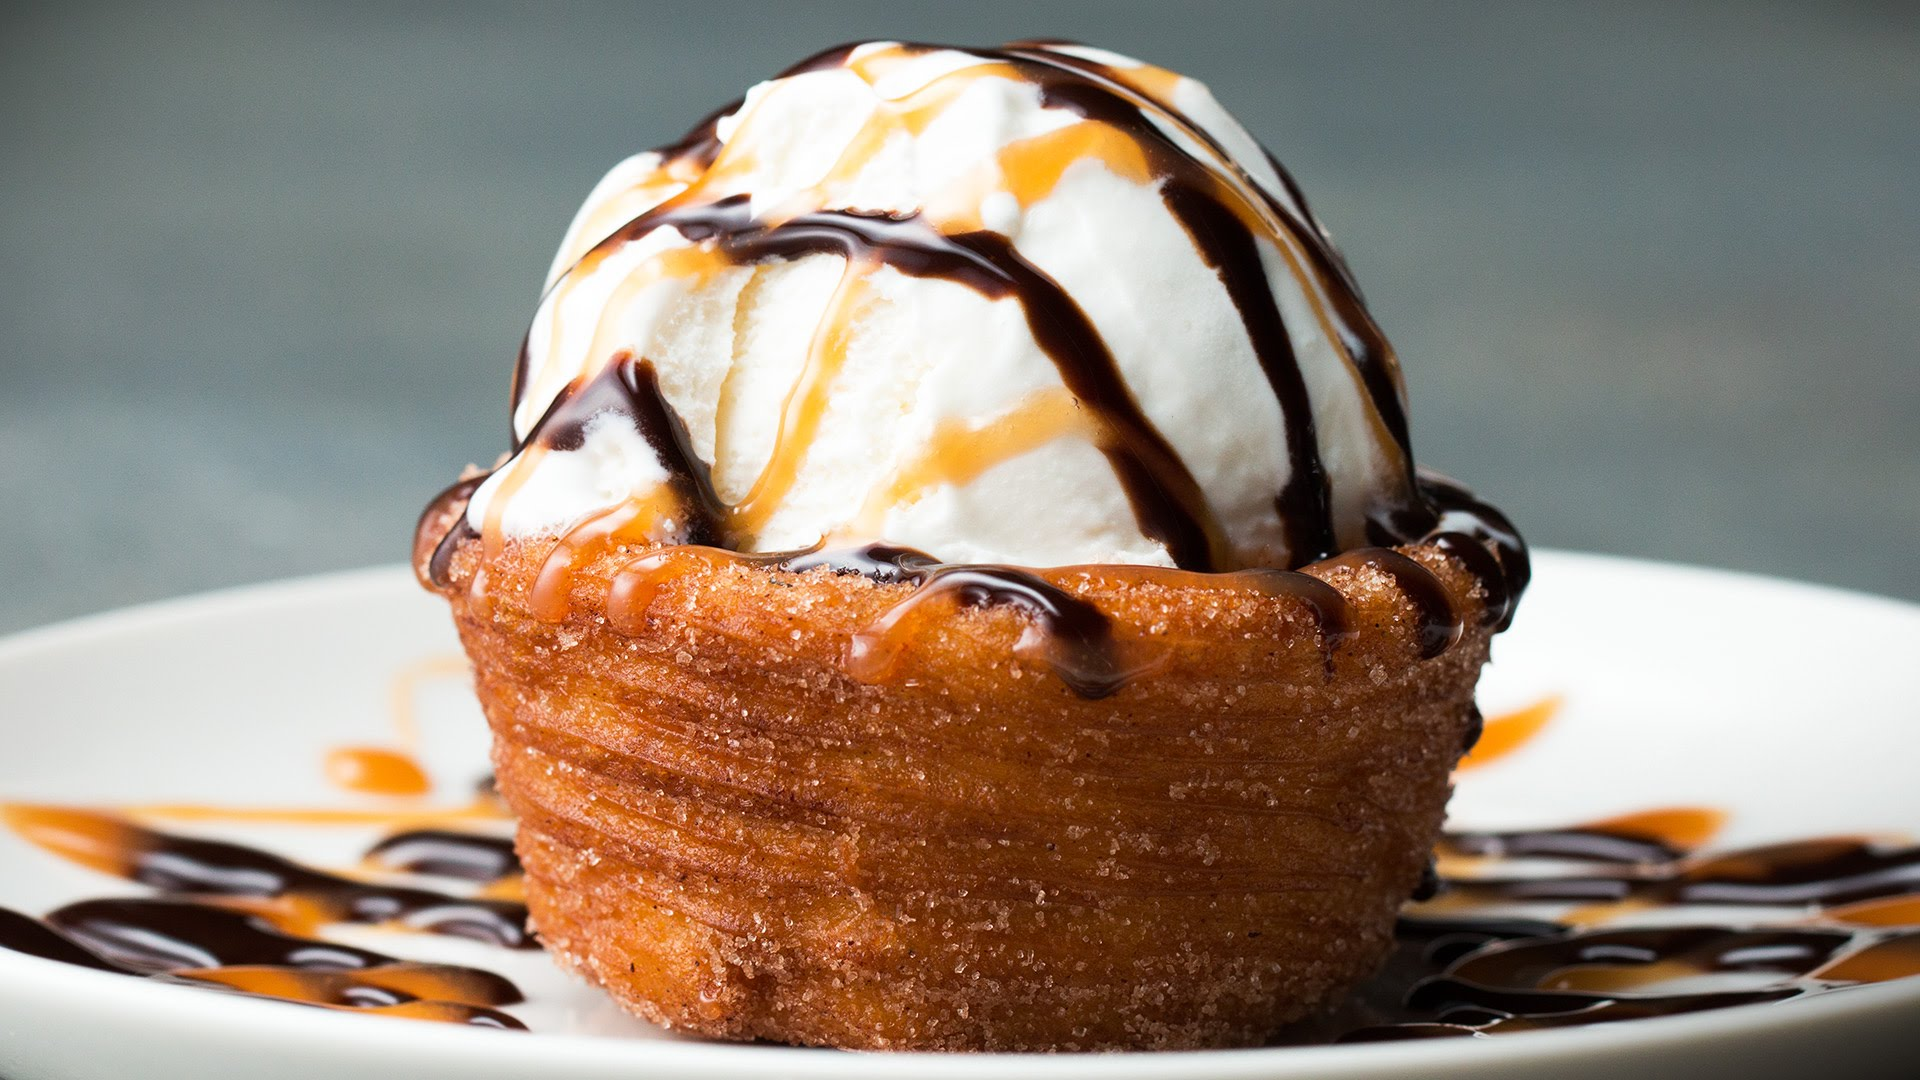 Six Benefits Of Eating Ice Cream